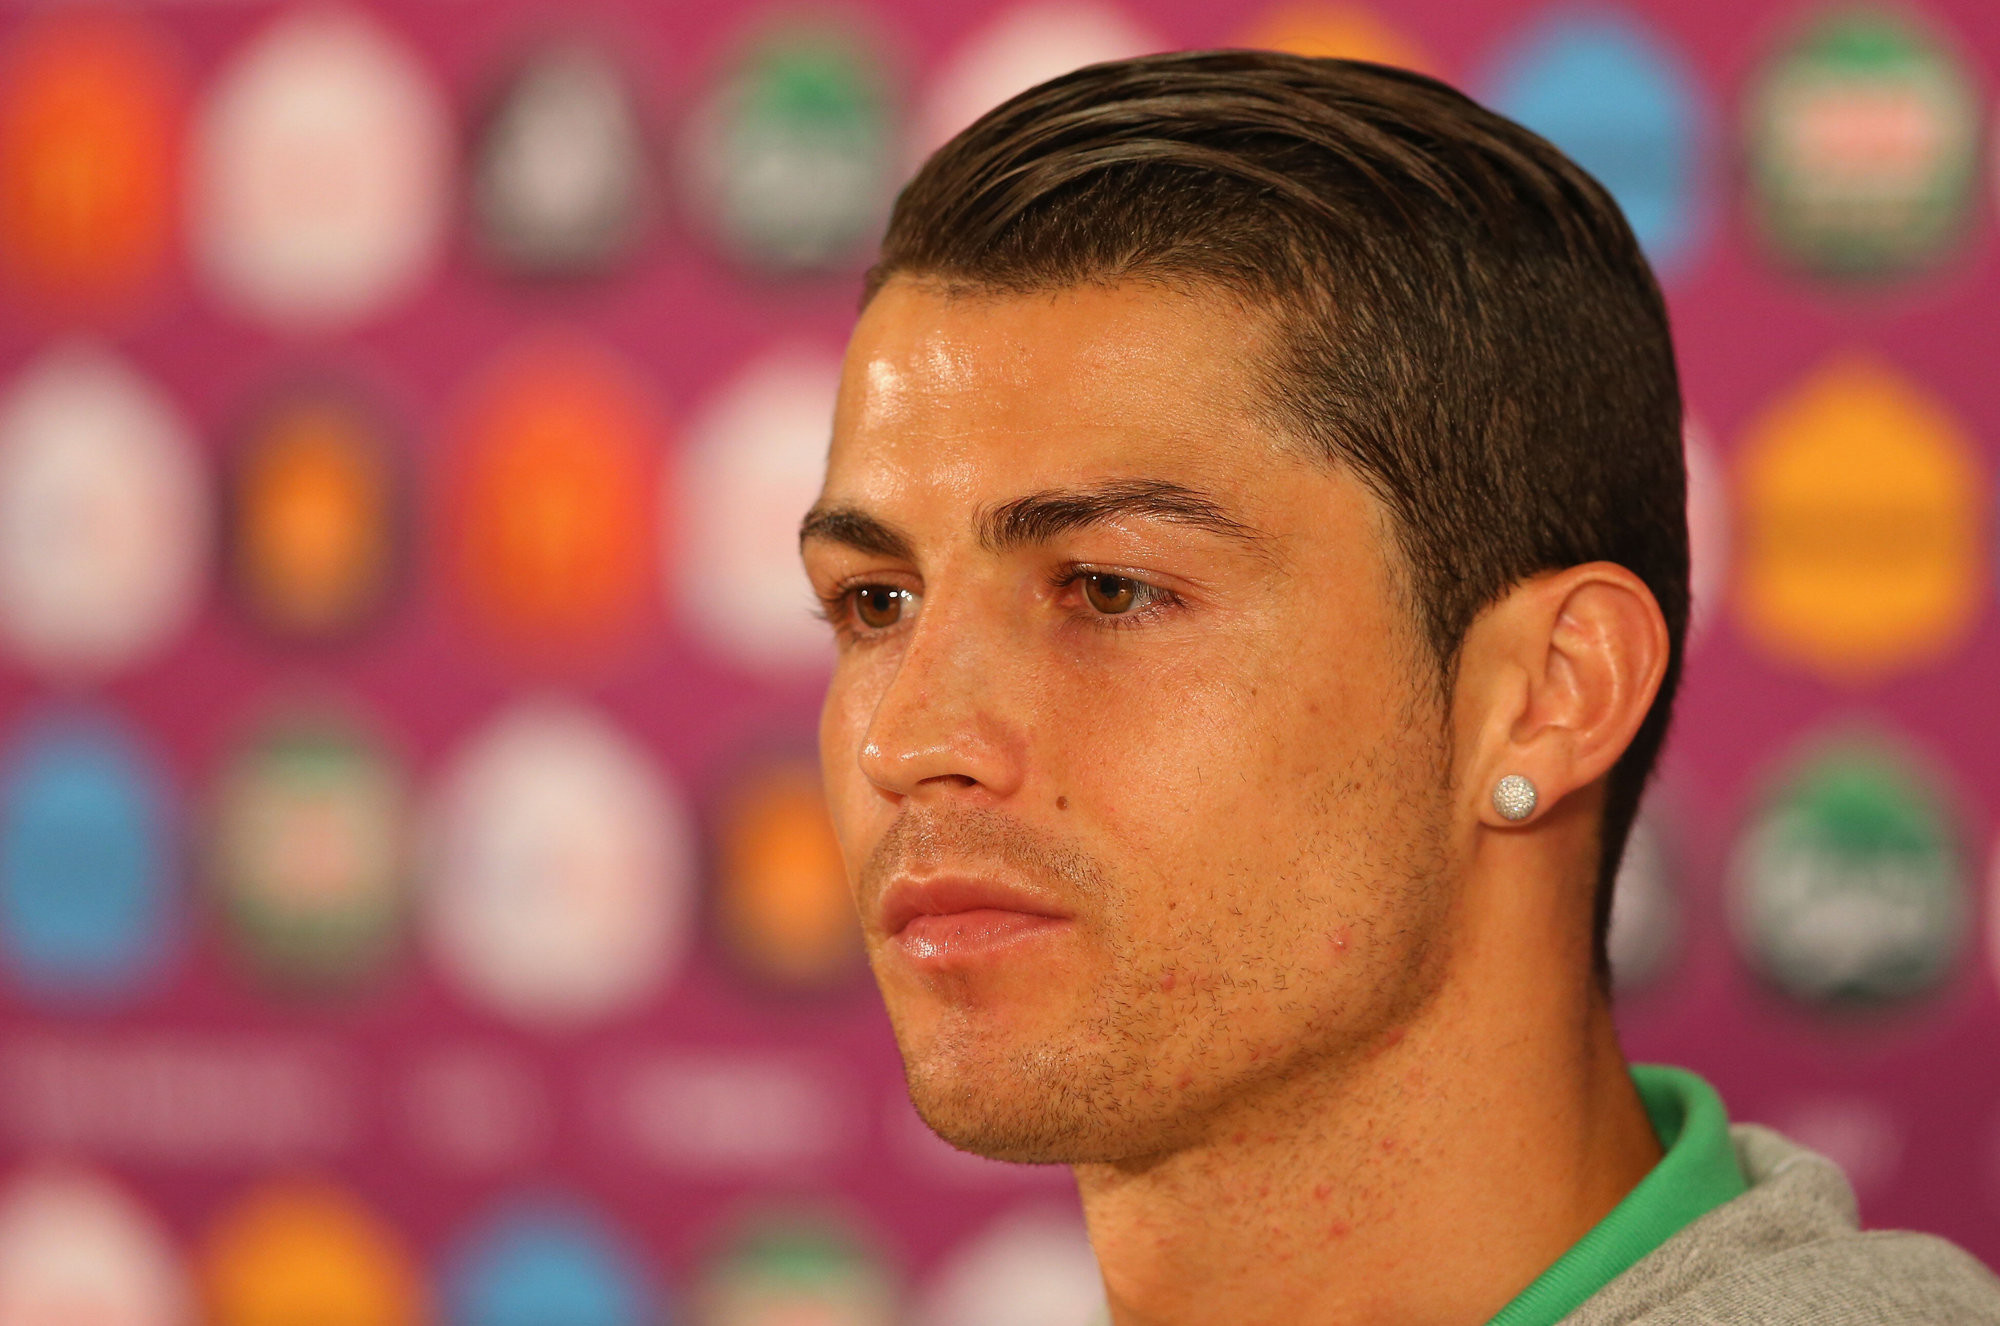 Cristiano Ronaldo HD WallpaperImagesPics HD Wallpapers Blog | HD Wallpapers  | Pinterest | Ronaldo, Hd wallpaper and Wallpaper